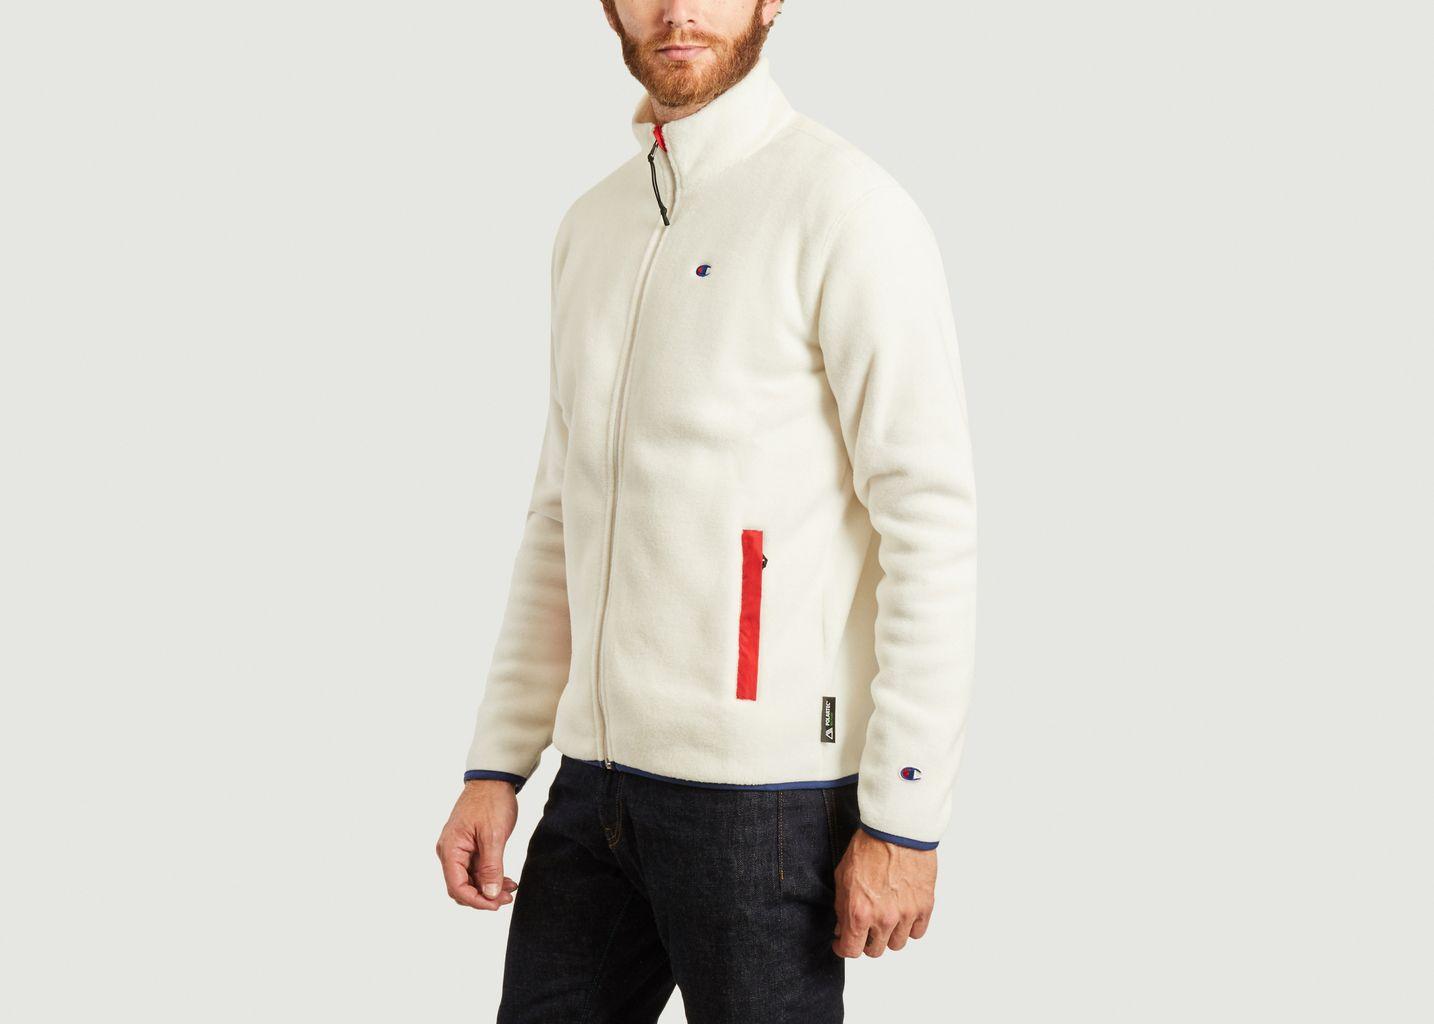 Veste zippée polaire Polartec logotypée - Champion